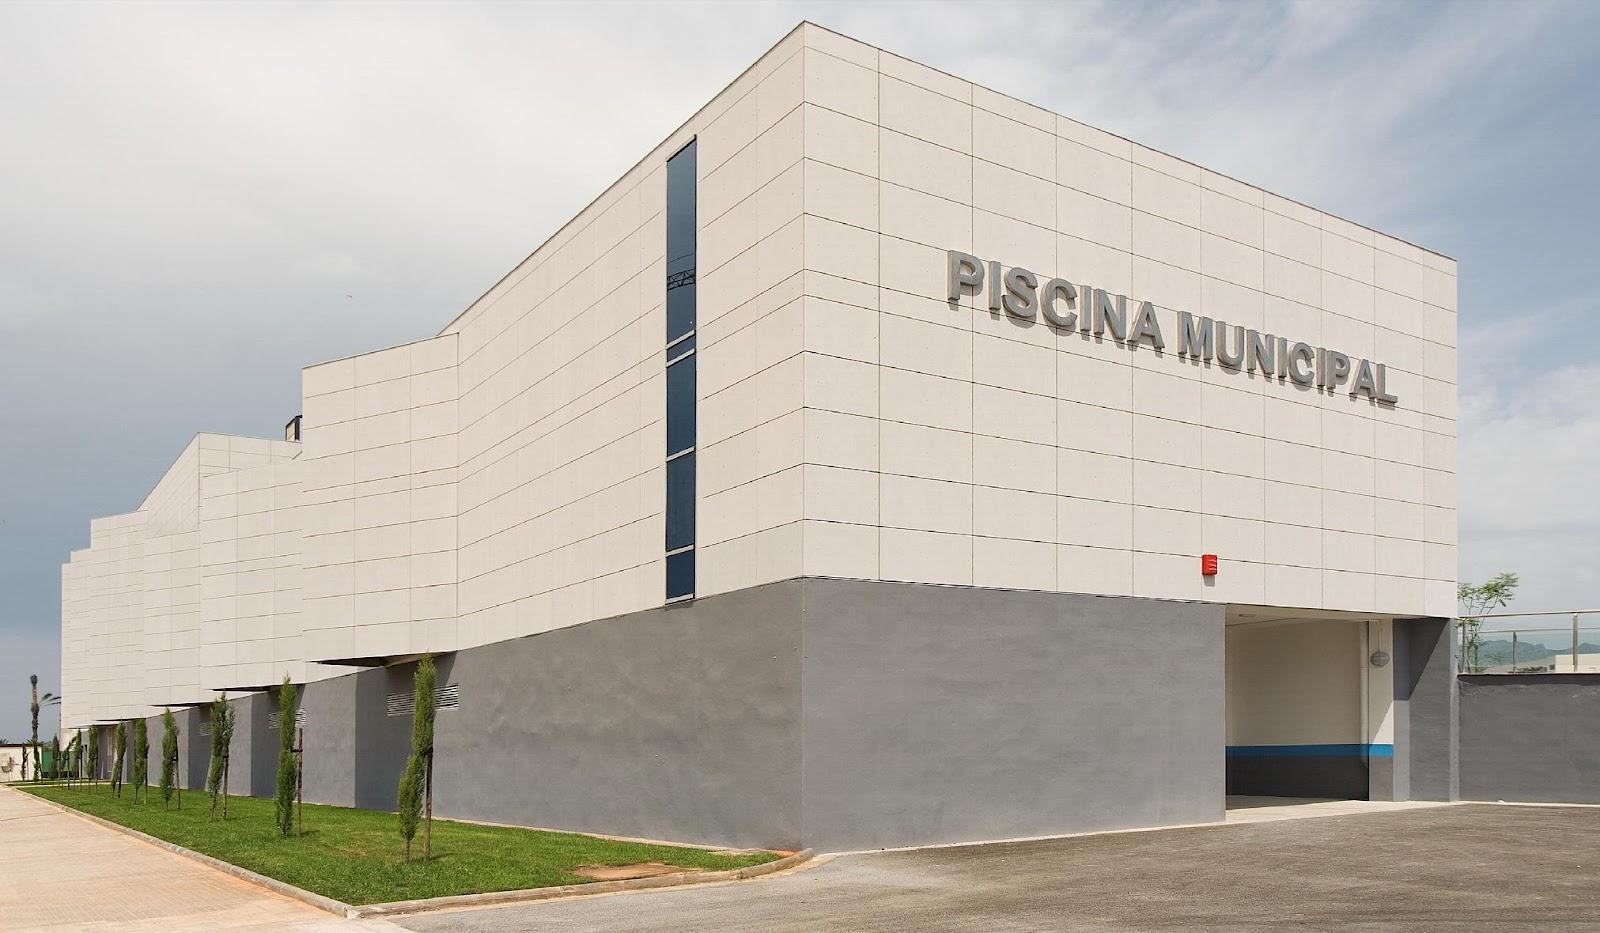 Cubiertas cerramientos cucel casos de xito piscina for Piscina municipal cubierta